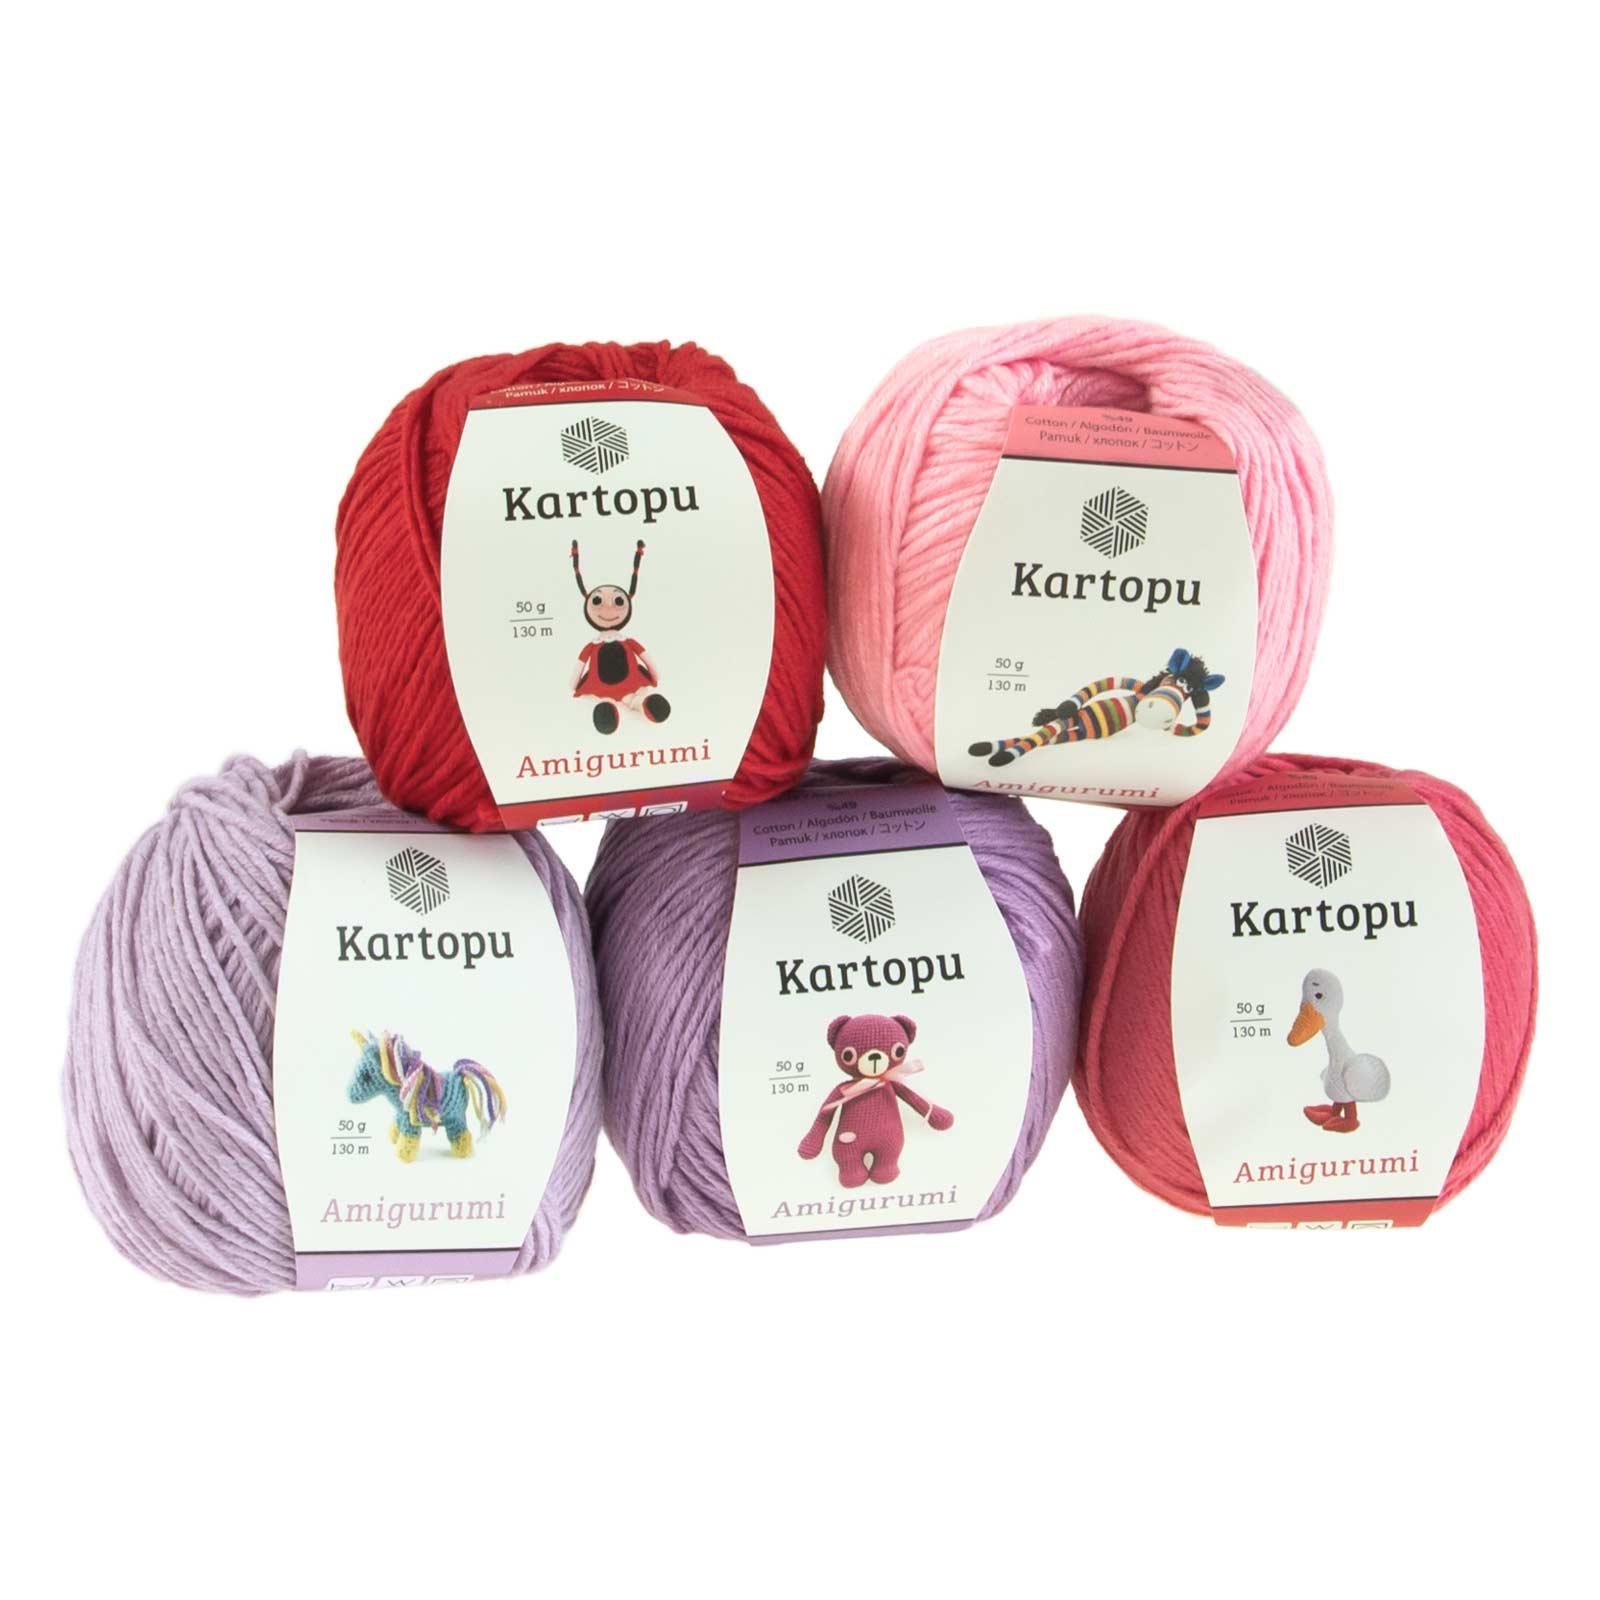 Kartopu Amigurumi   Knitting Yarn   Online Yarn Store – VILRITA   1600x1600